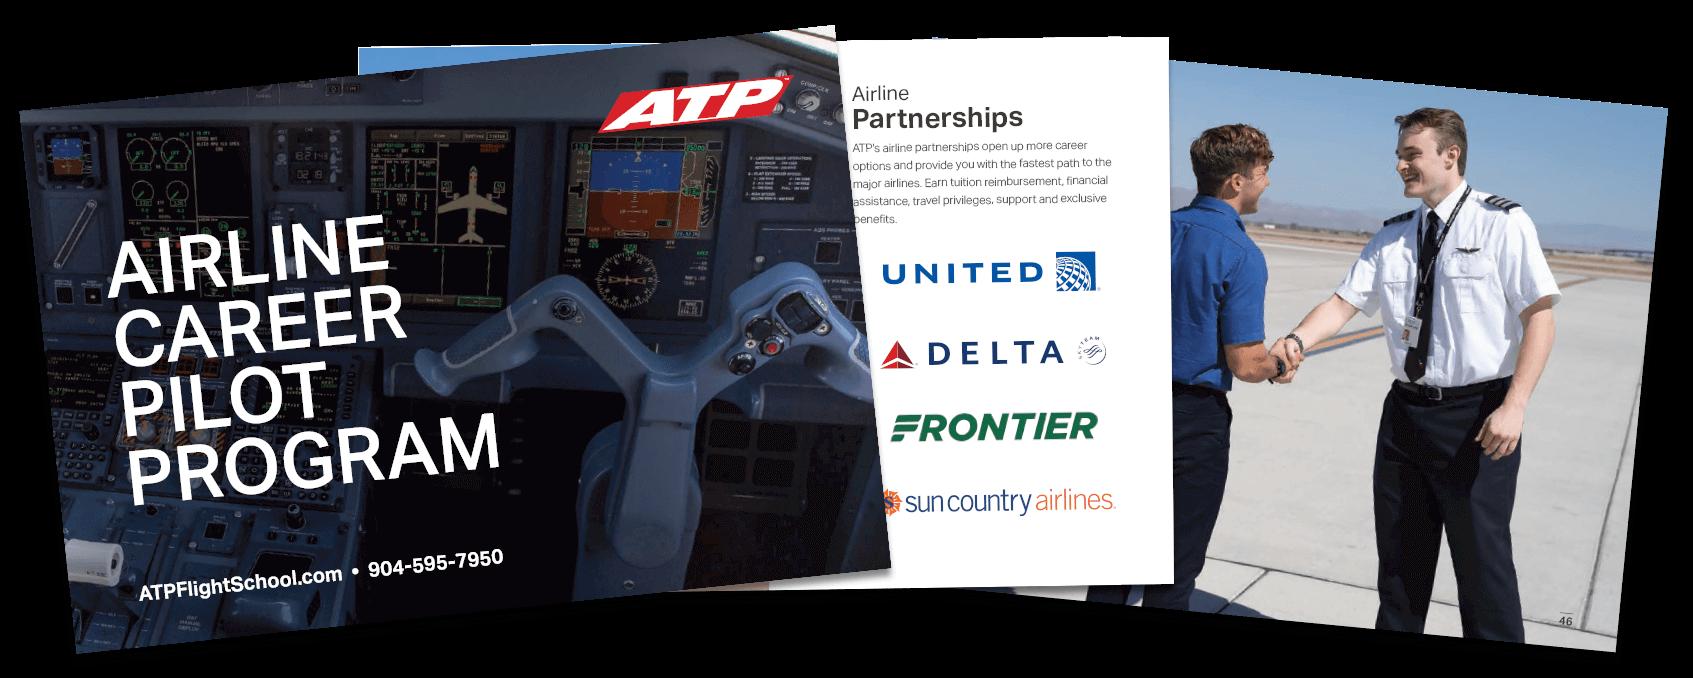 Airline Career Pilot Program Guide PDF